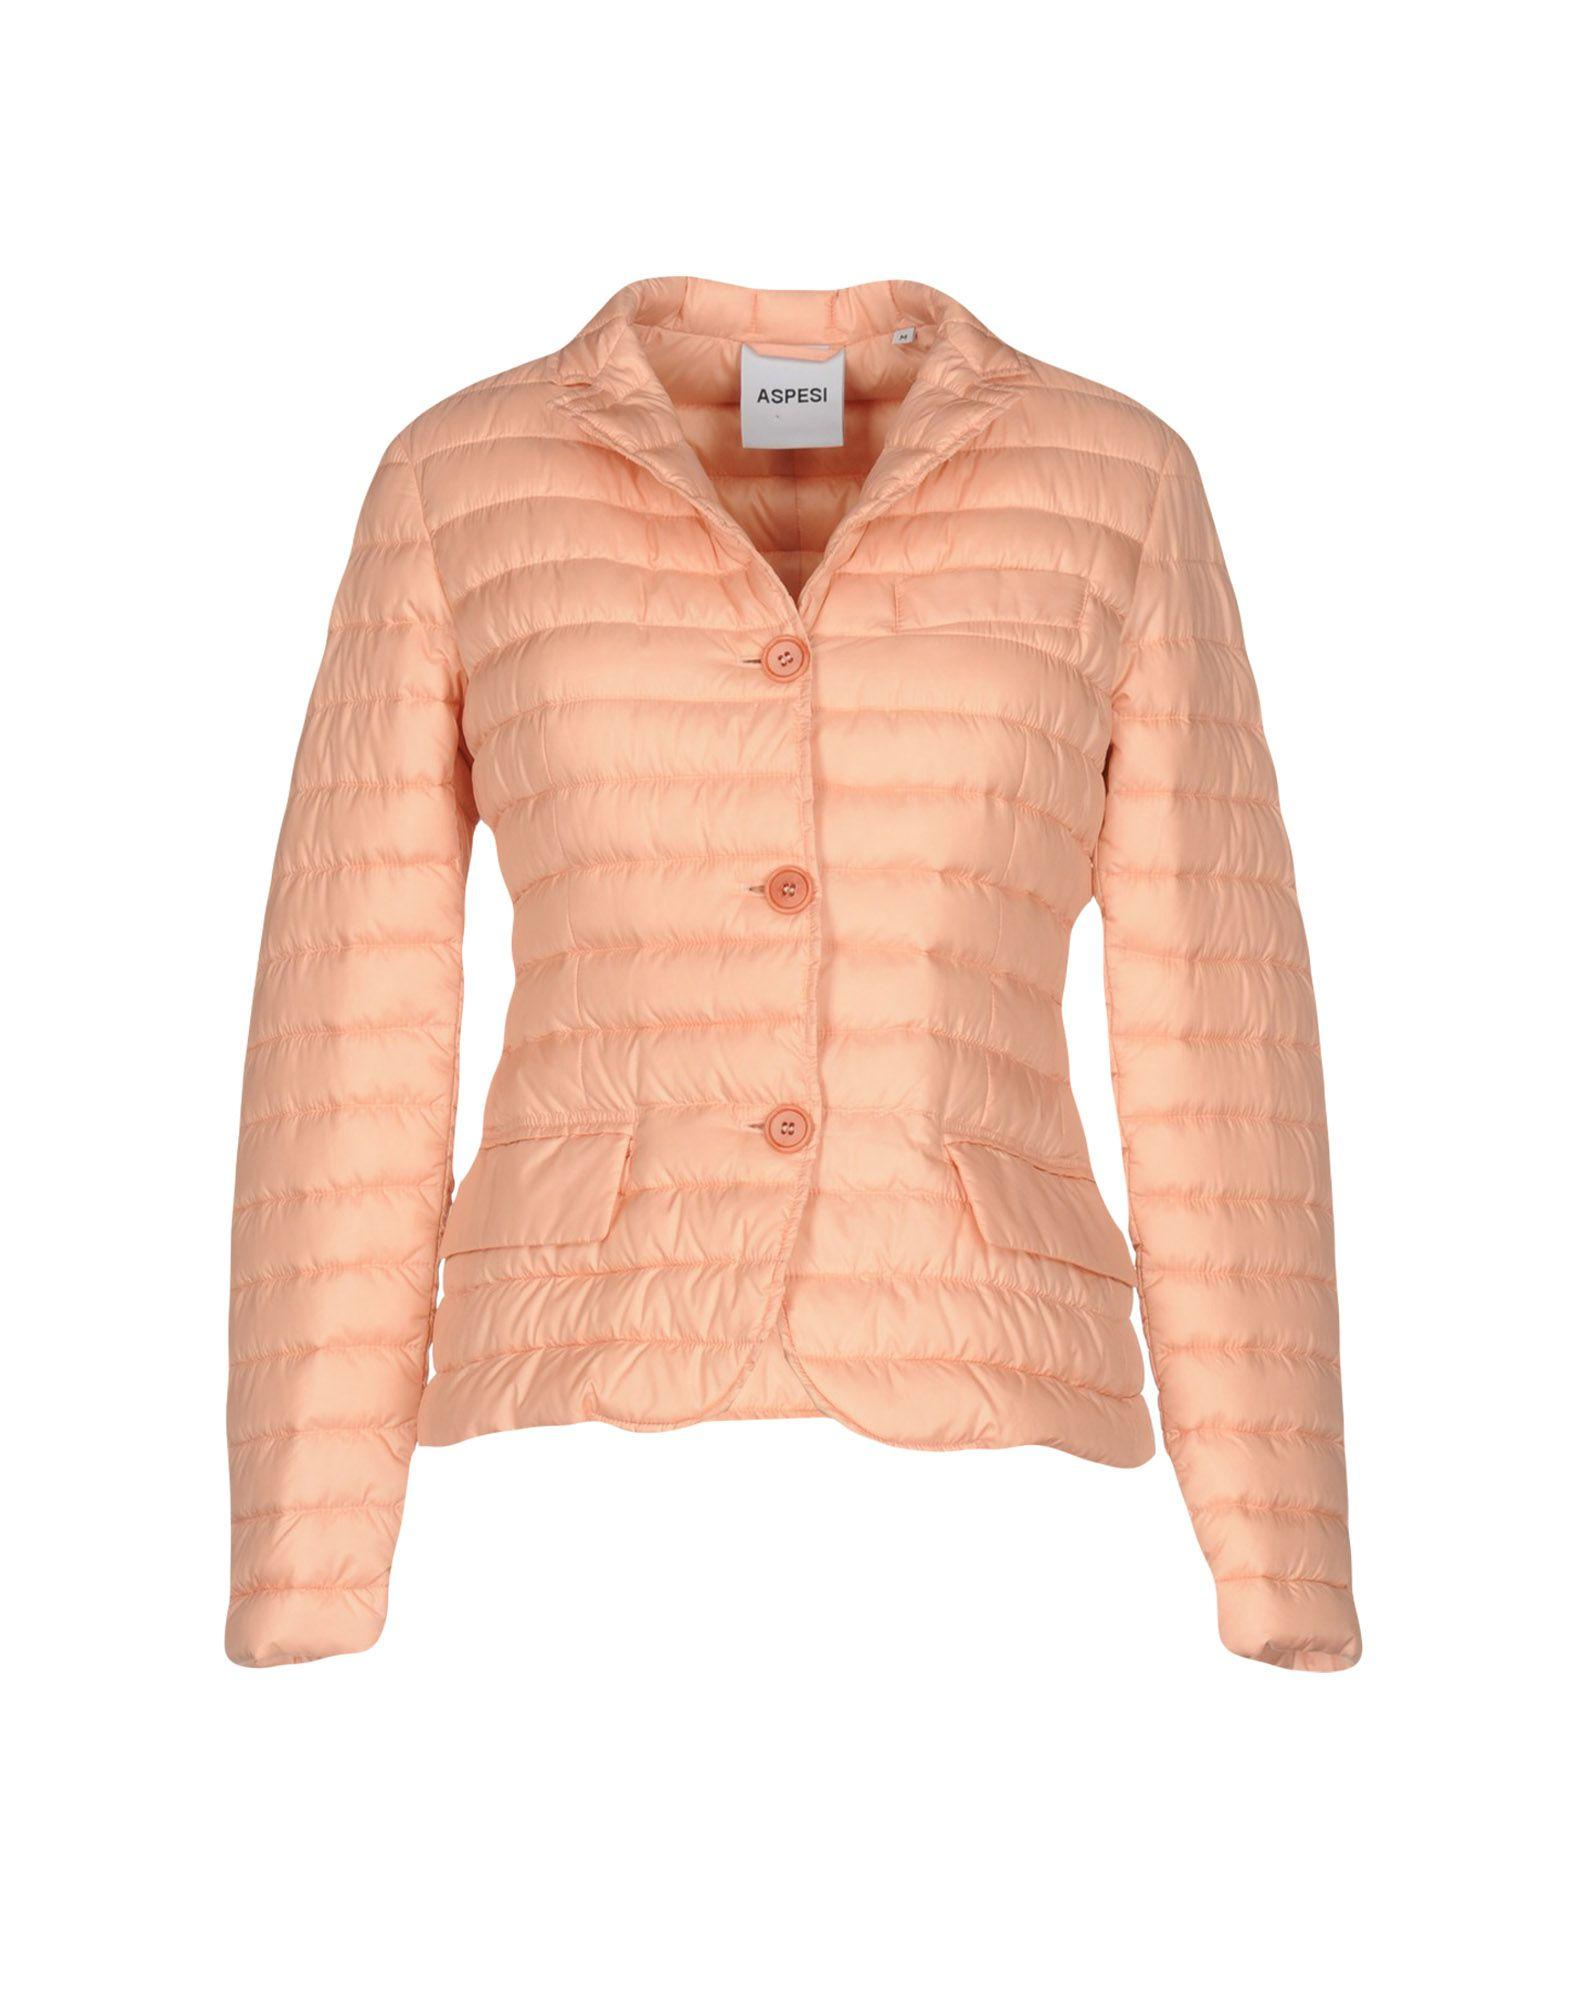 Aspesi Down Jackets In Salmon Pink